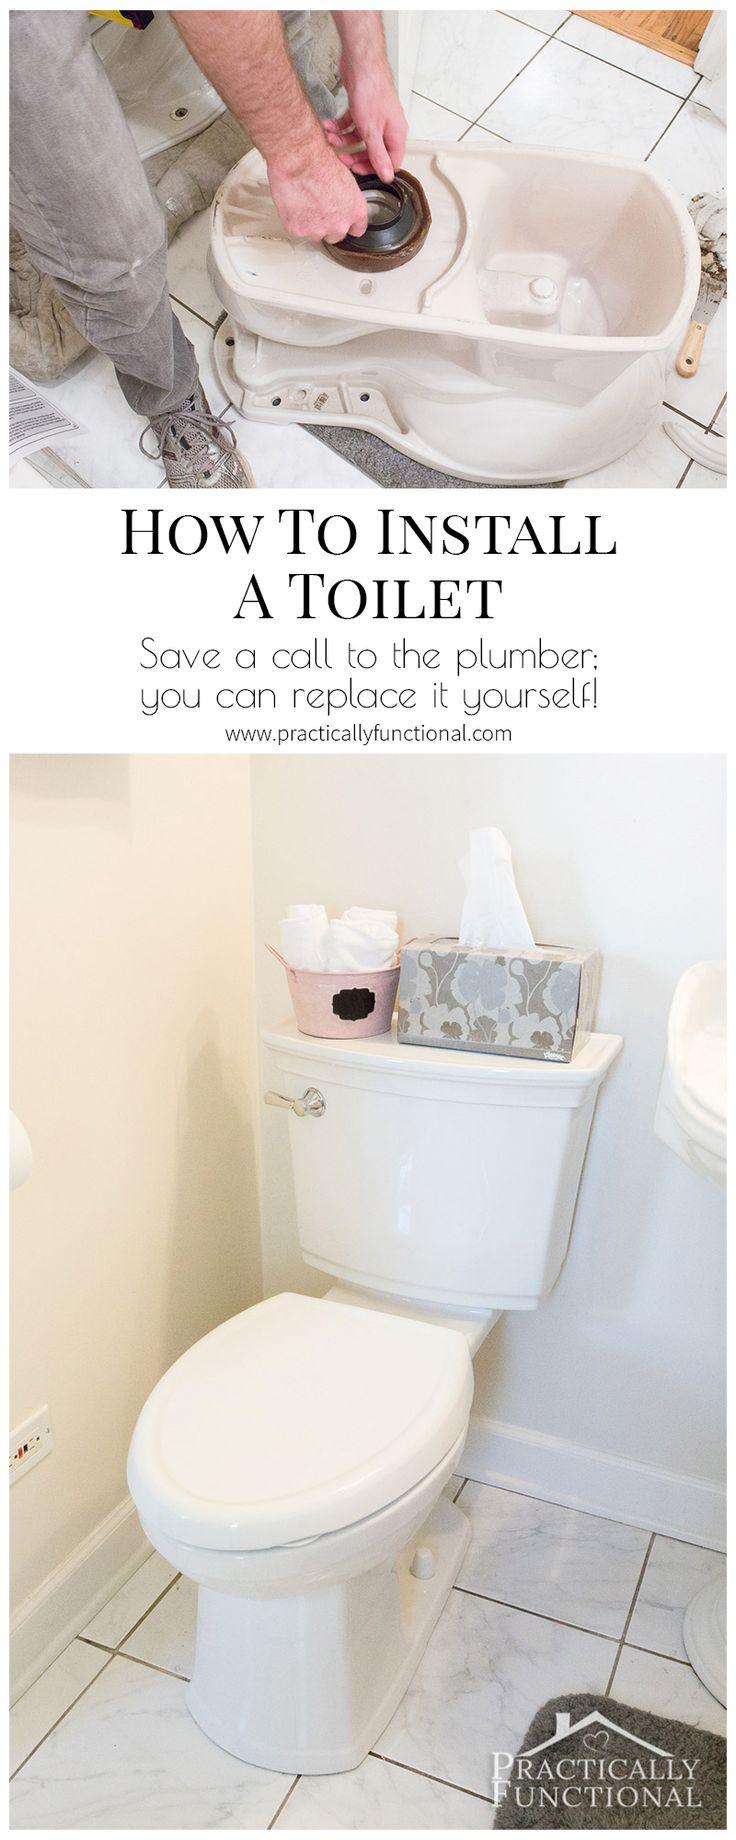 25 best ideas about toilet installation on pinterest art installation bathroom shelves and. Black Bedroom Furniture Sets. Home Design Ideas